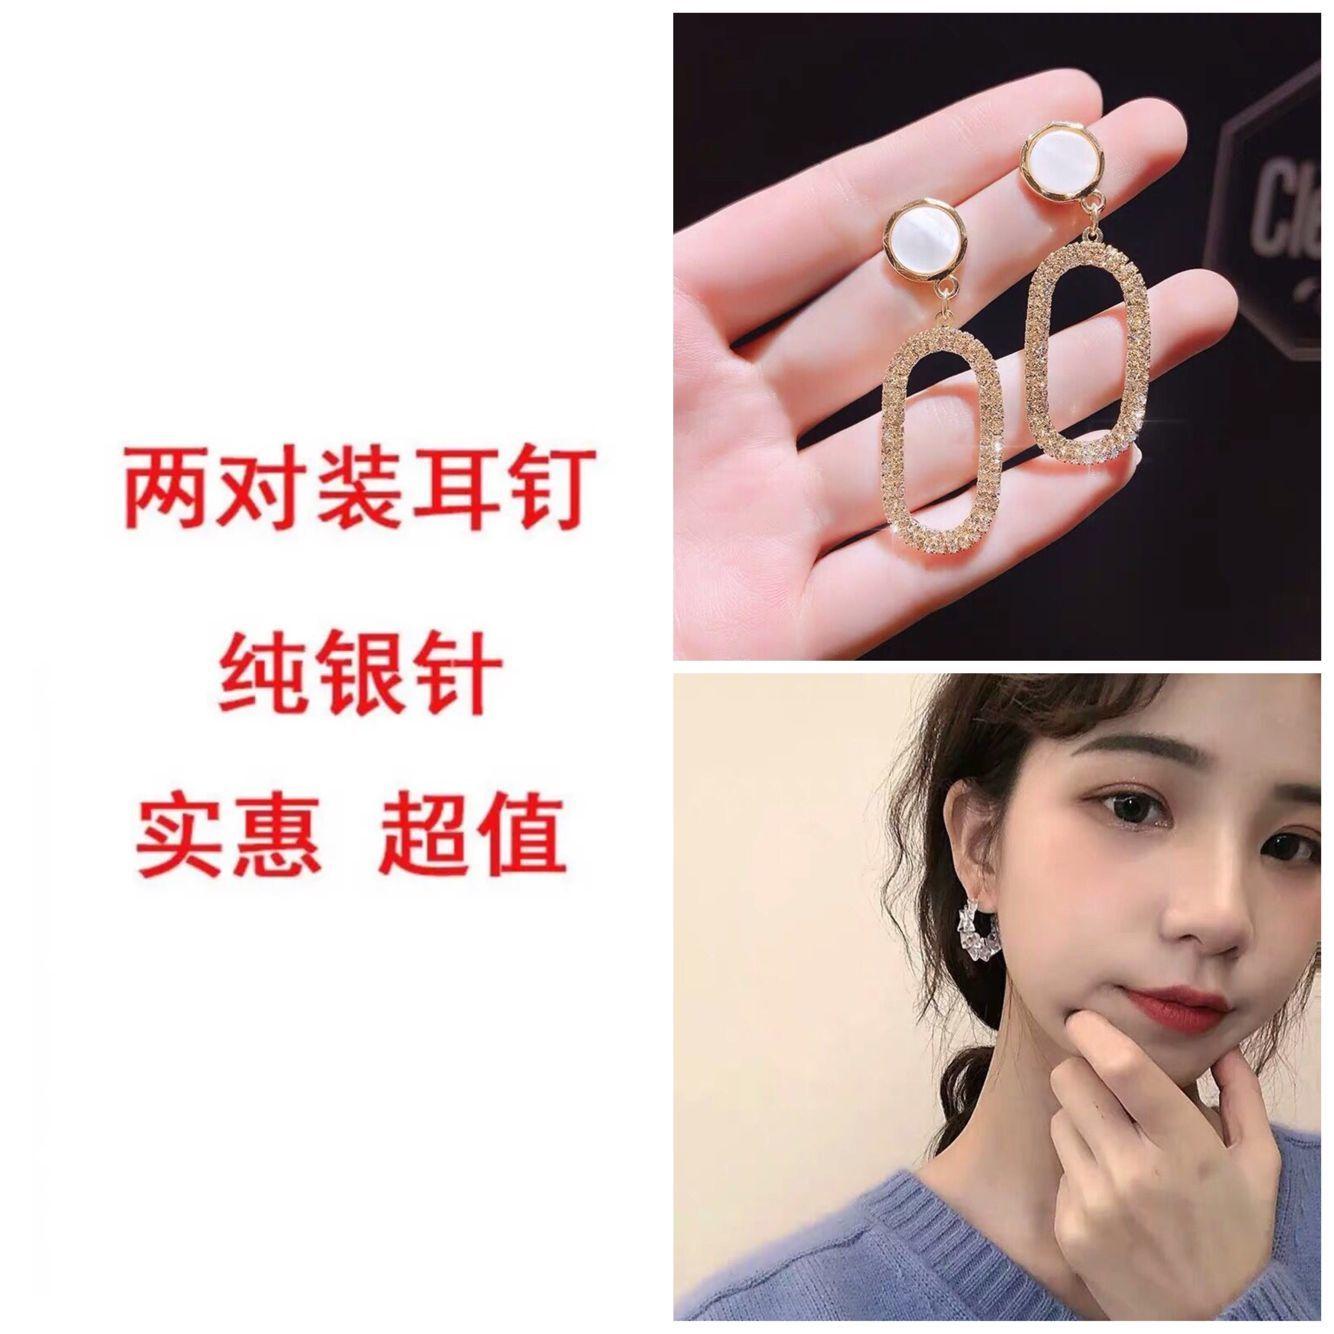 17 Super Fairy Crystal Oval Earrings